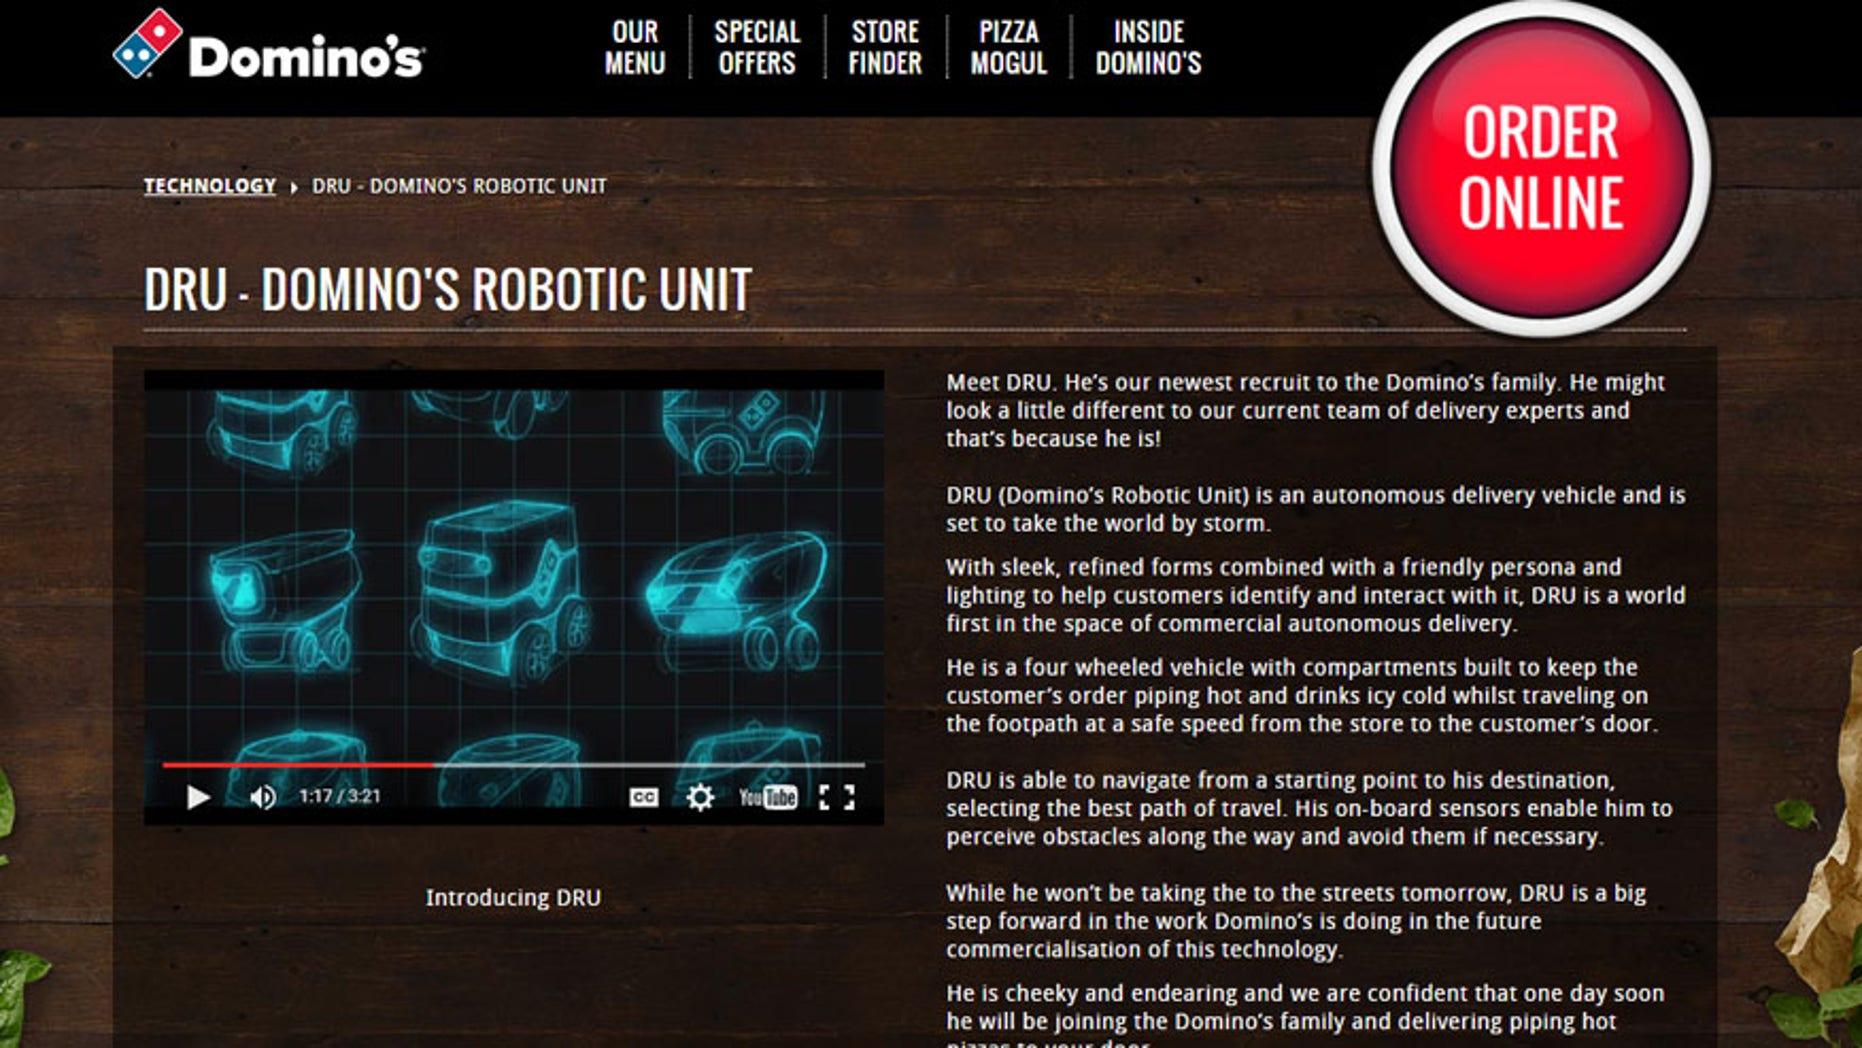 Screenshot from www.dominos.com.au/inside-dominos/technology/dru